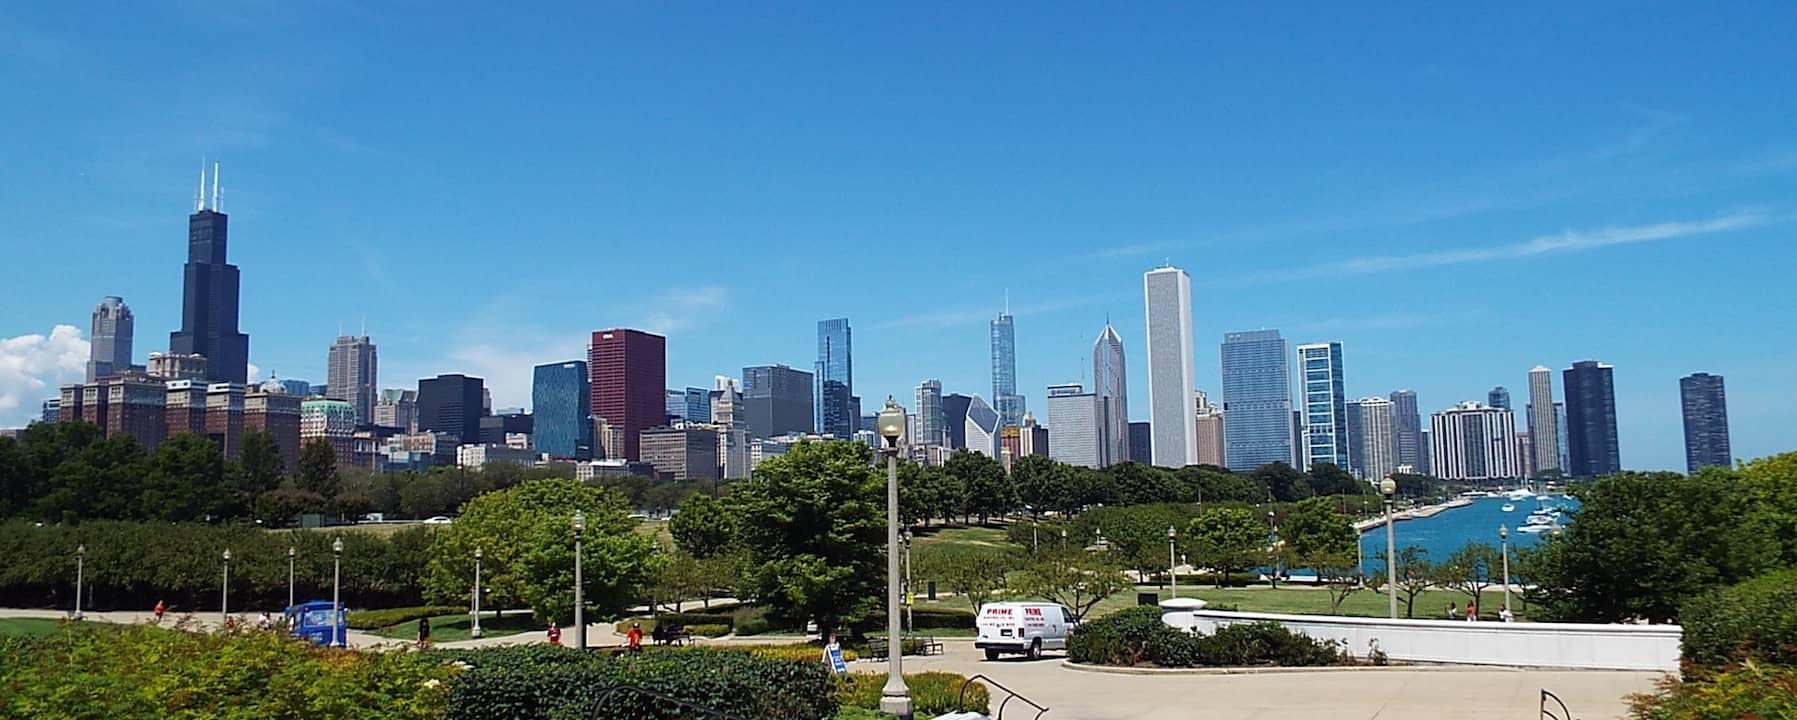 Chicago to Illinois Route 66 Video